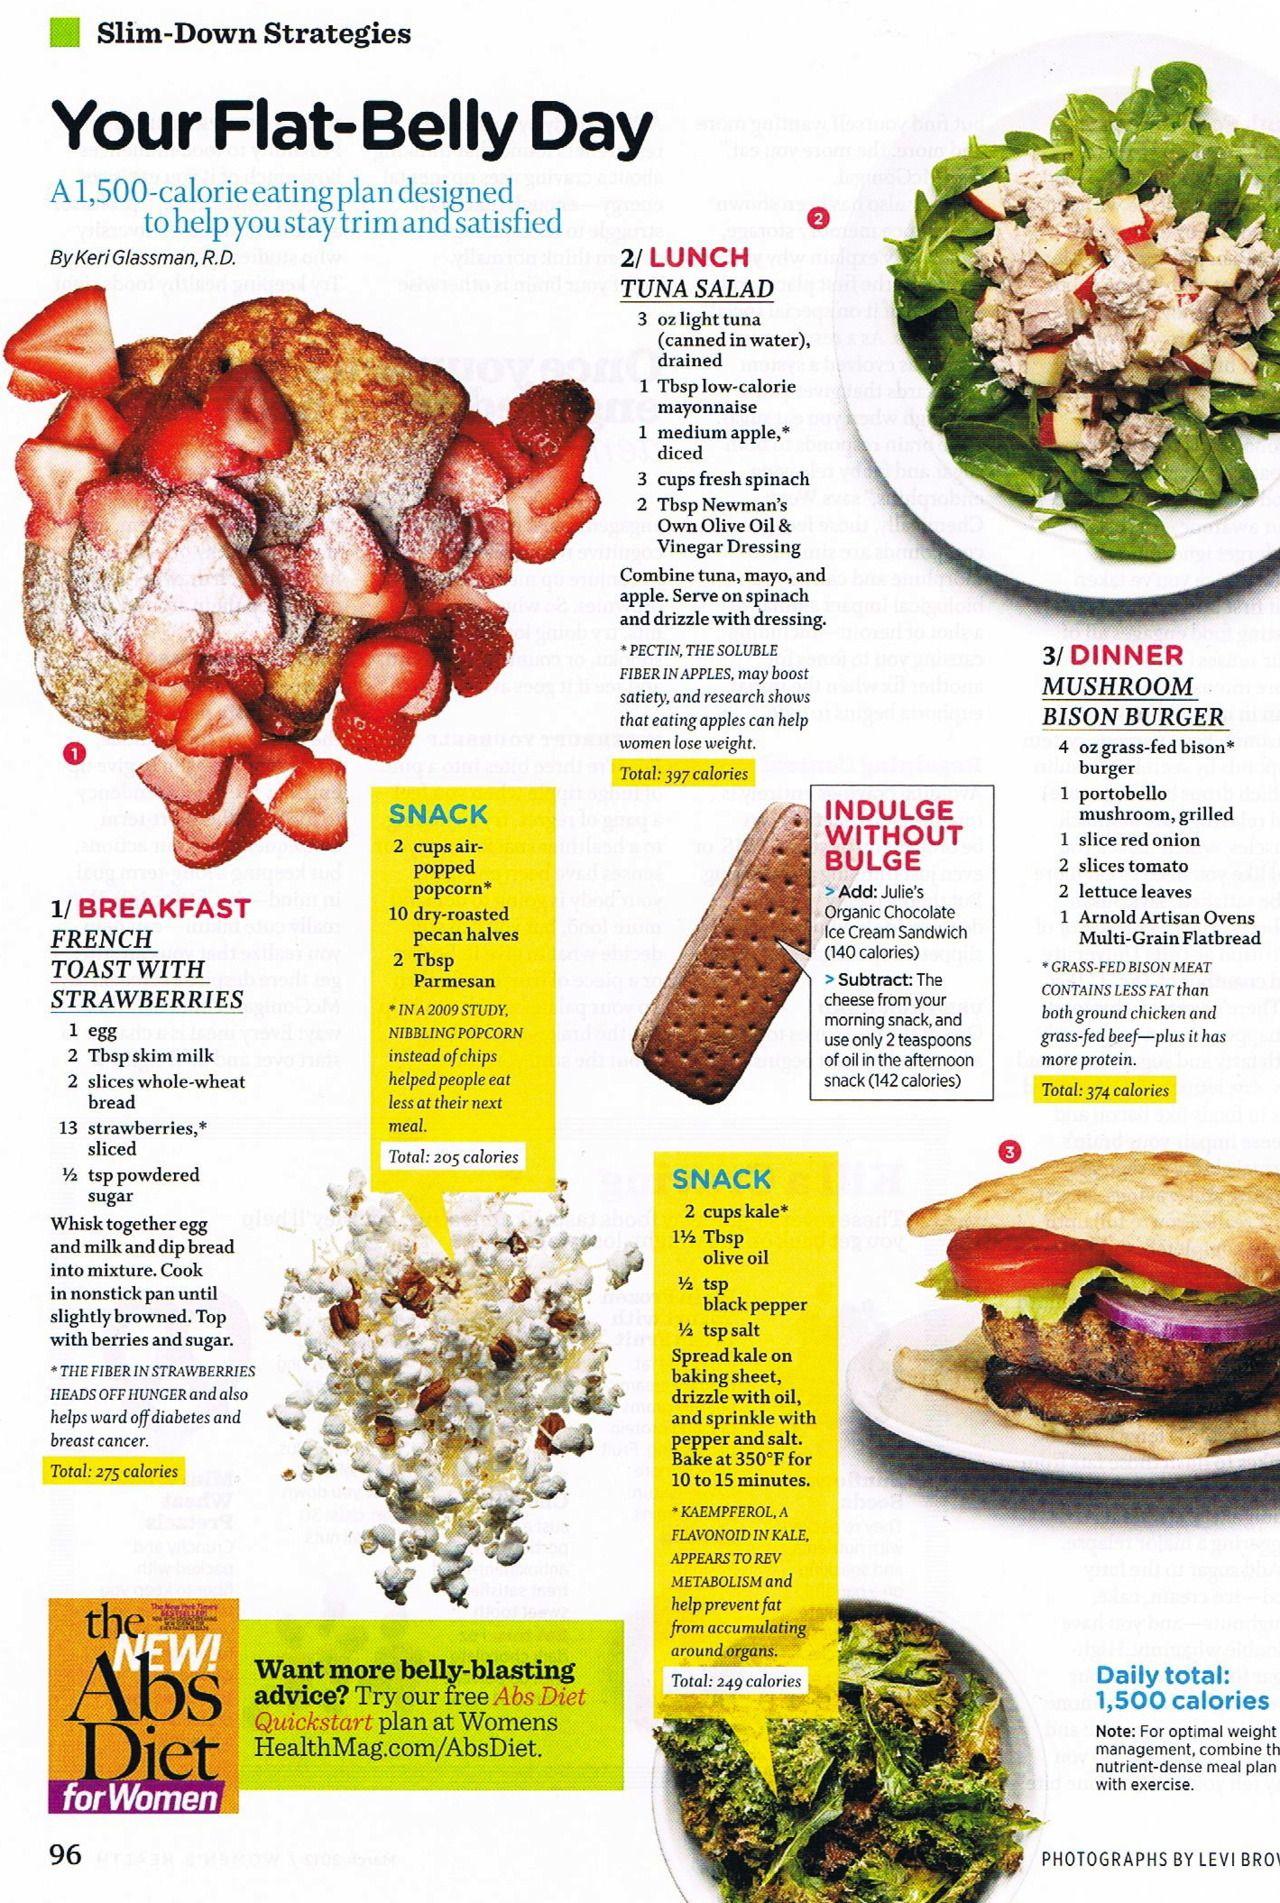 5 lb diet plan